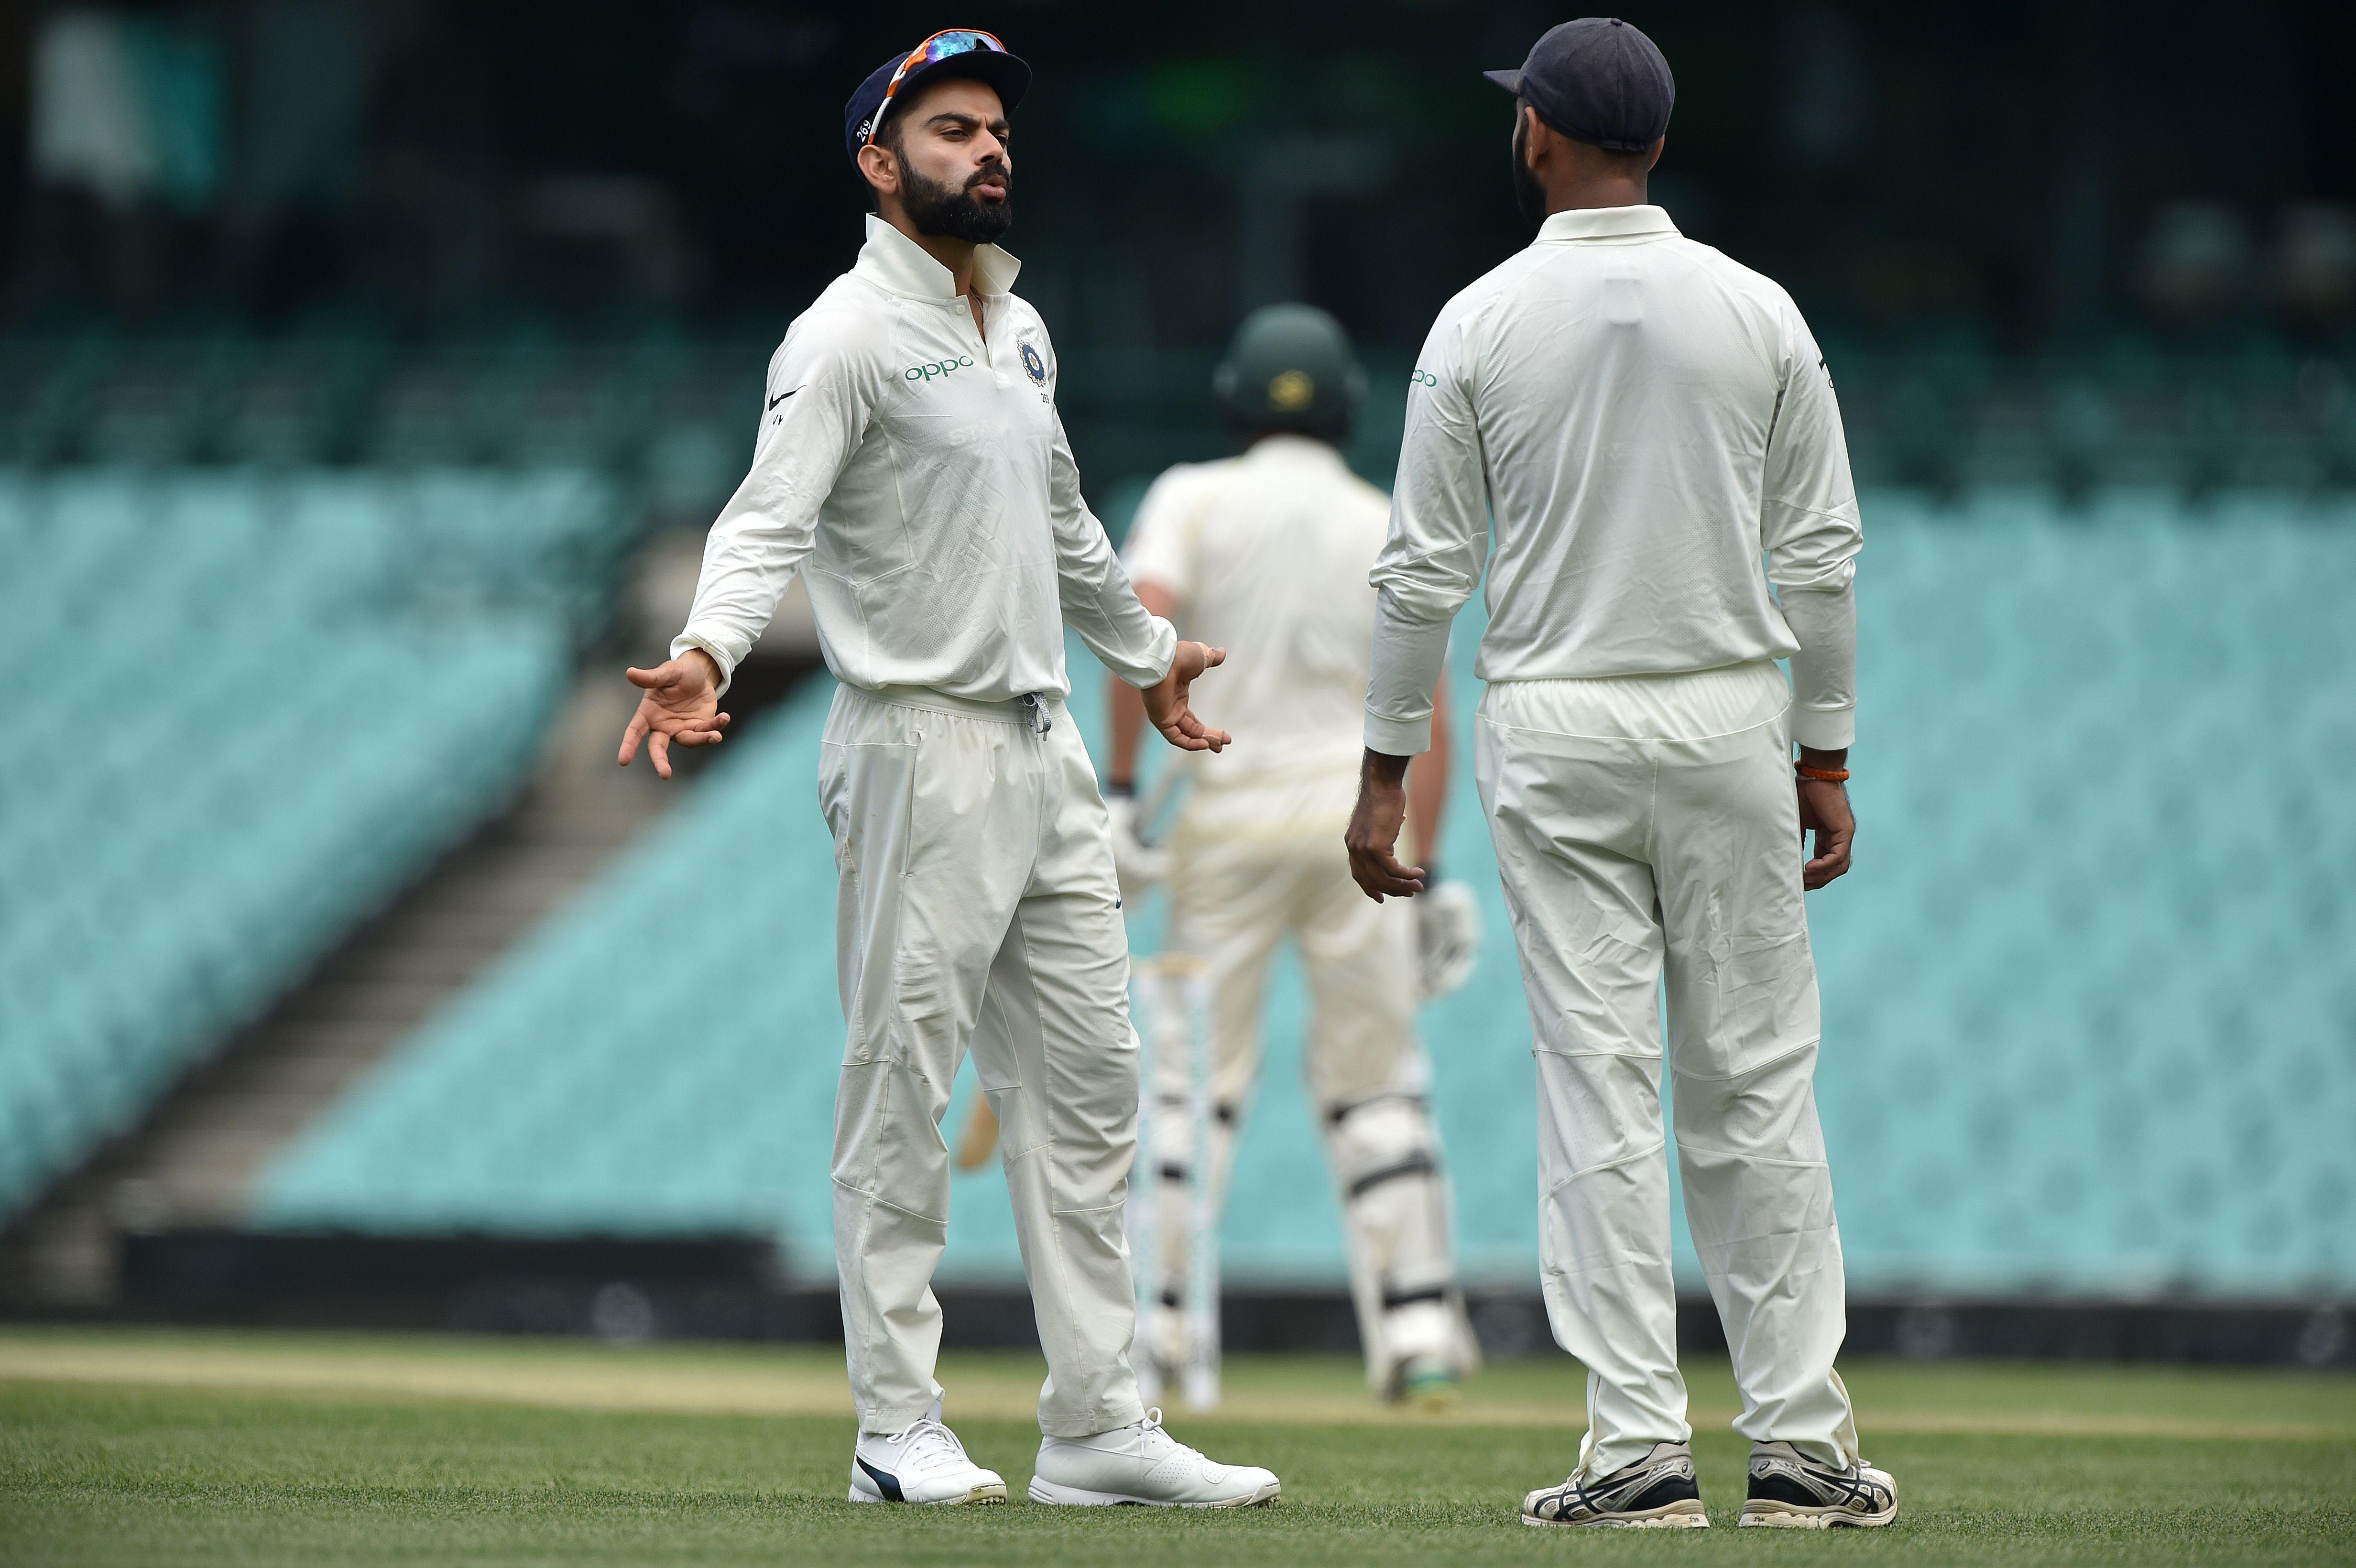 sports news, cricket news in hindi, Virat kohli, Australia Players, Aggressive Attitude, Test series